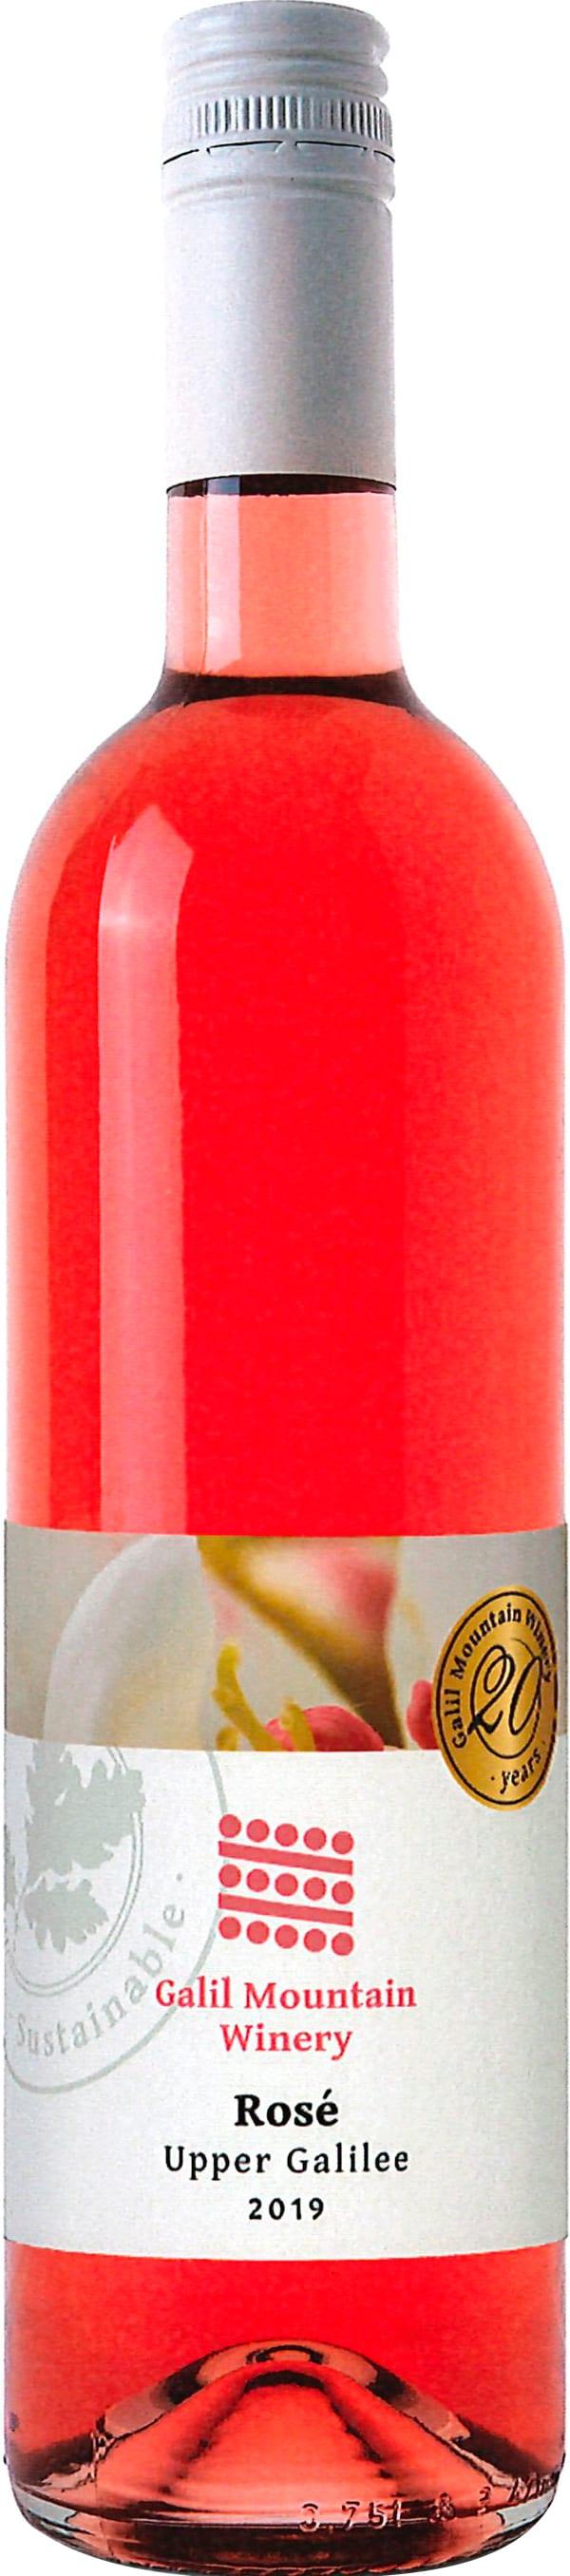 Galil Mountain Rosé 2020